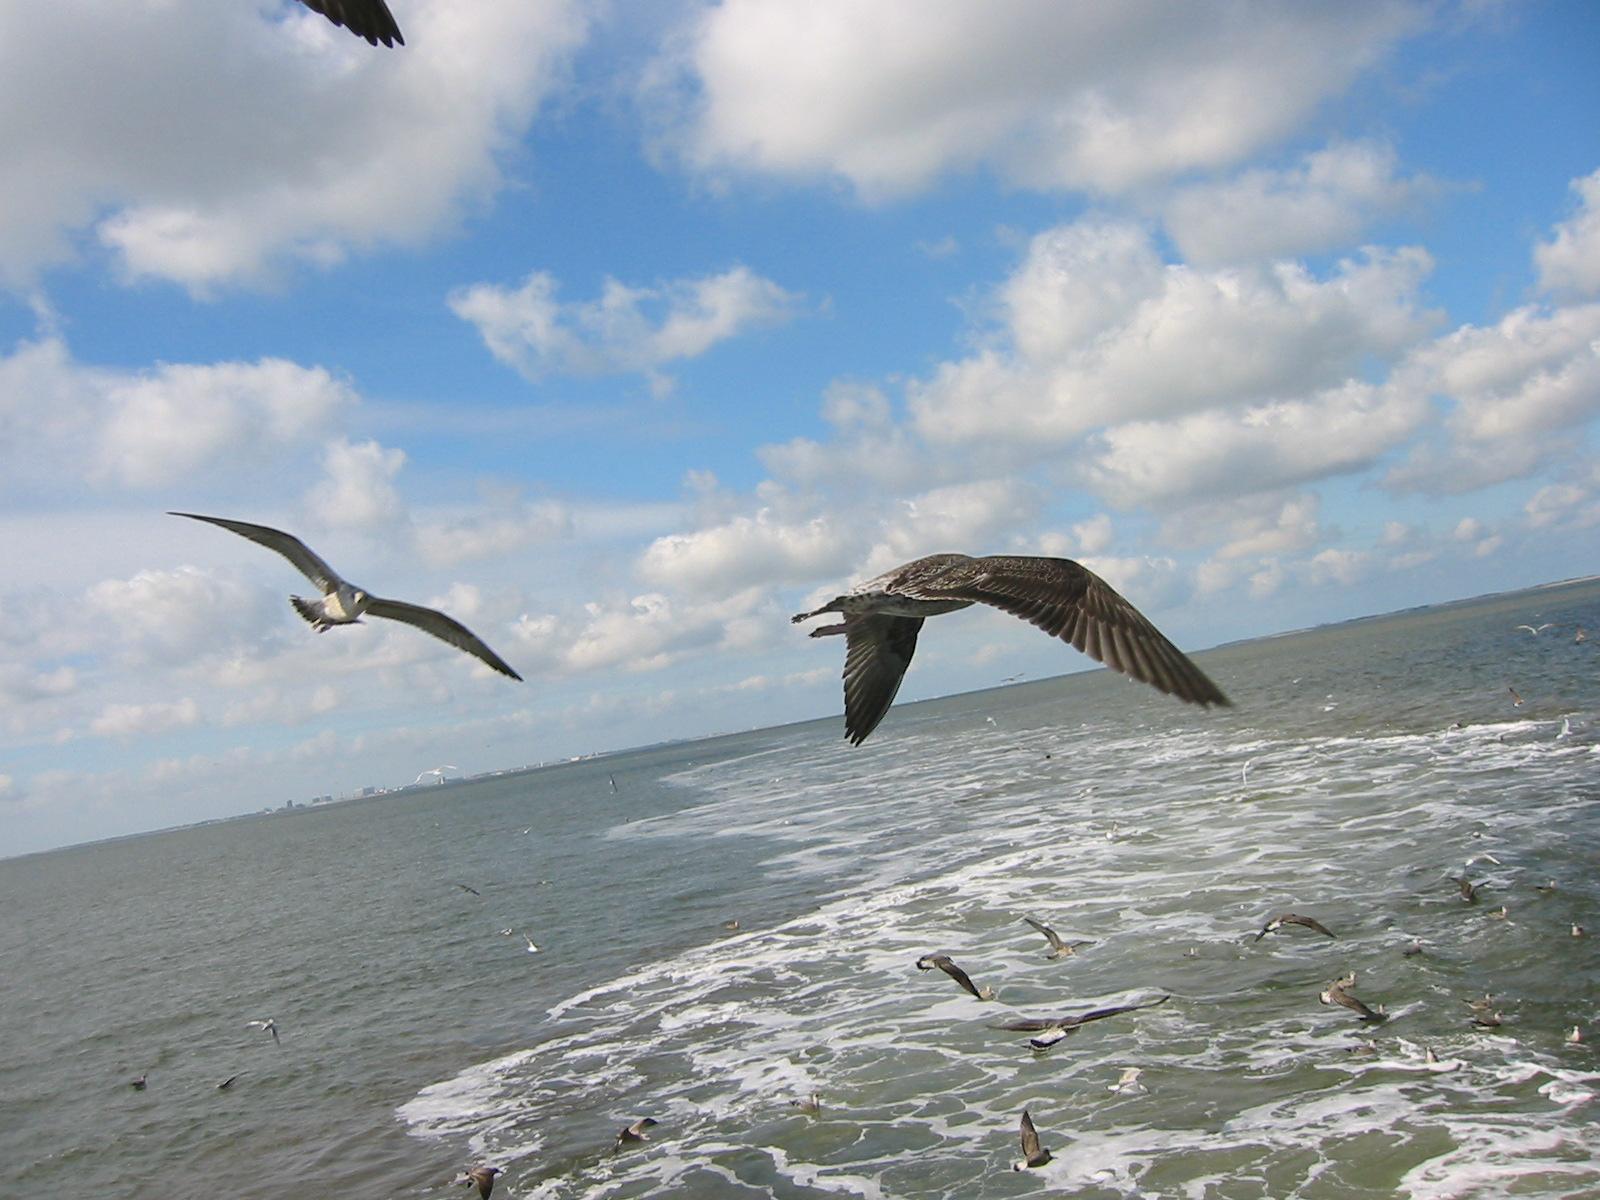 jaap birds seagulls flying sea ocean blue sky